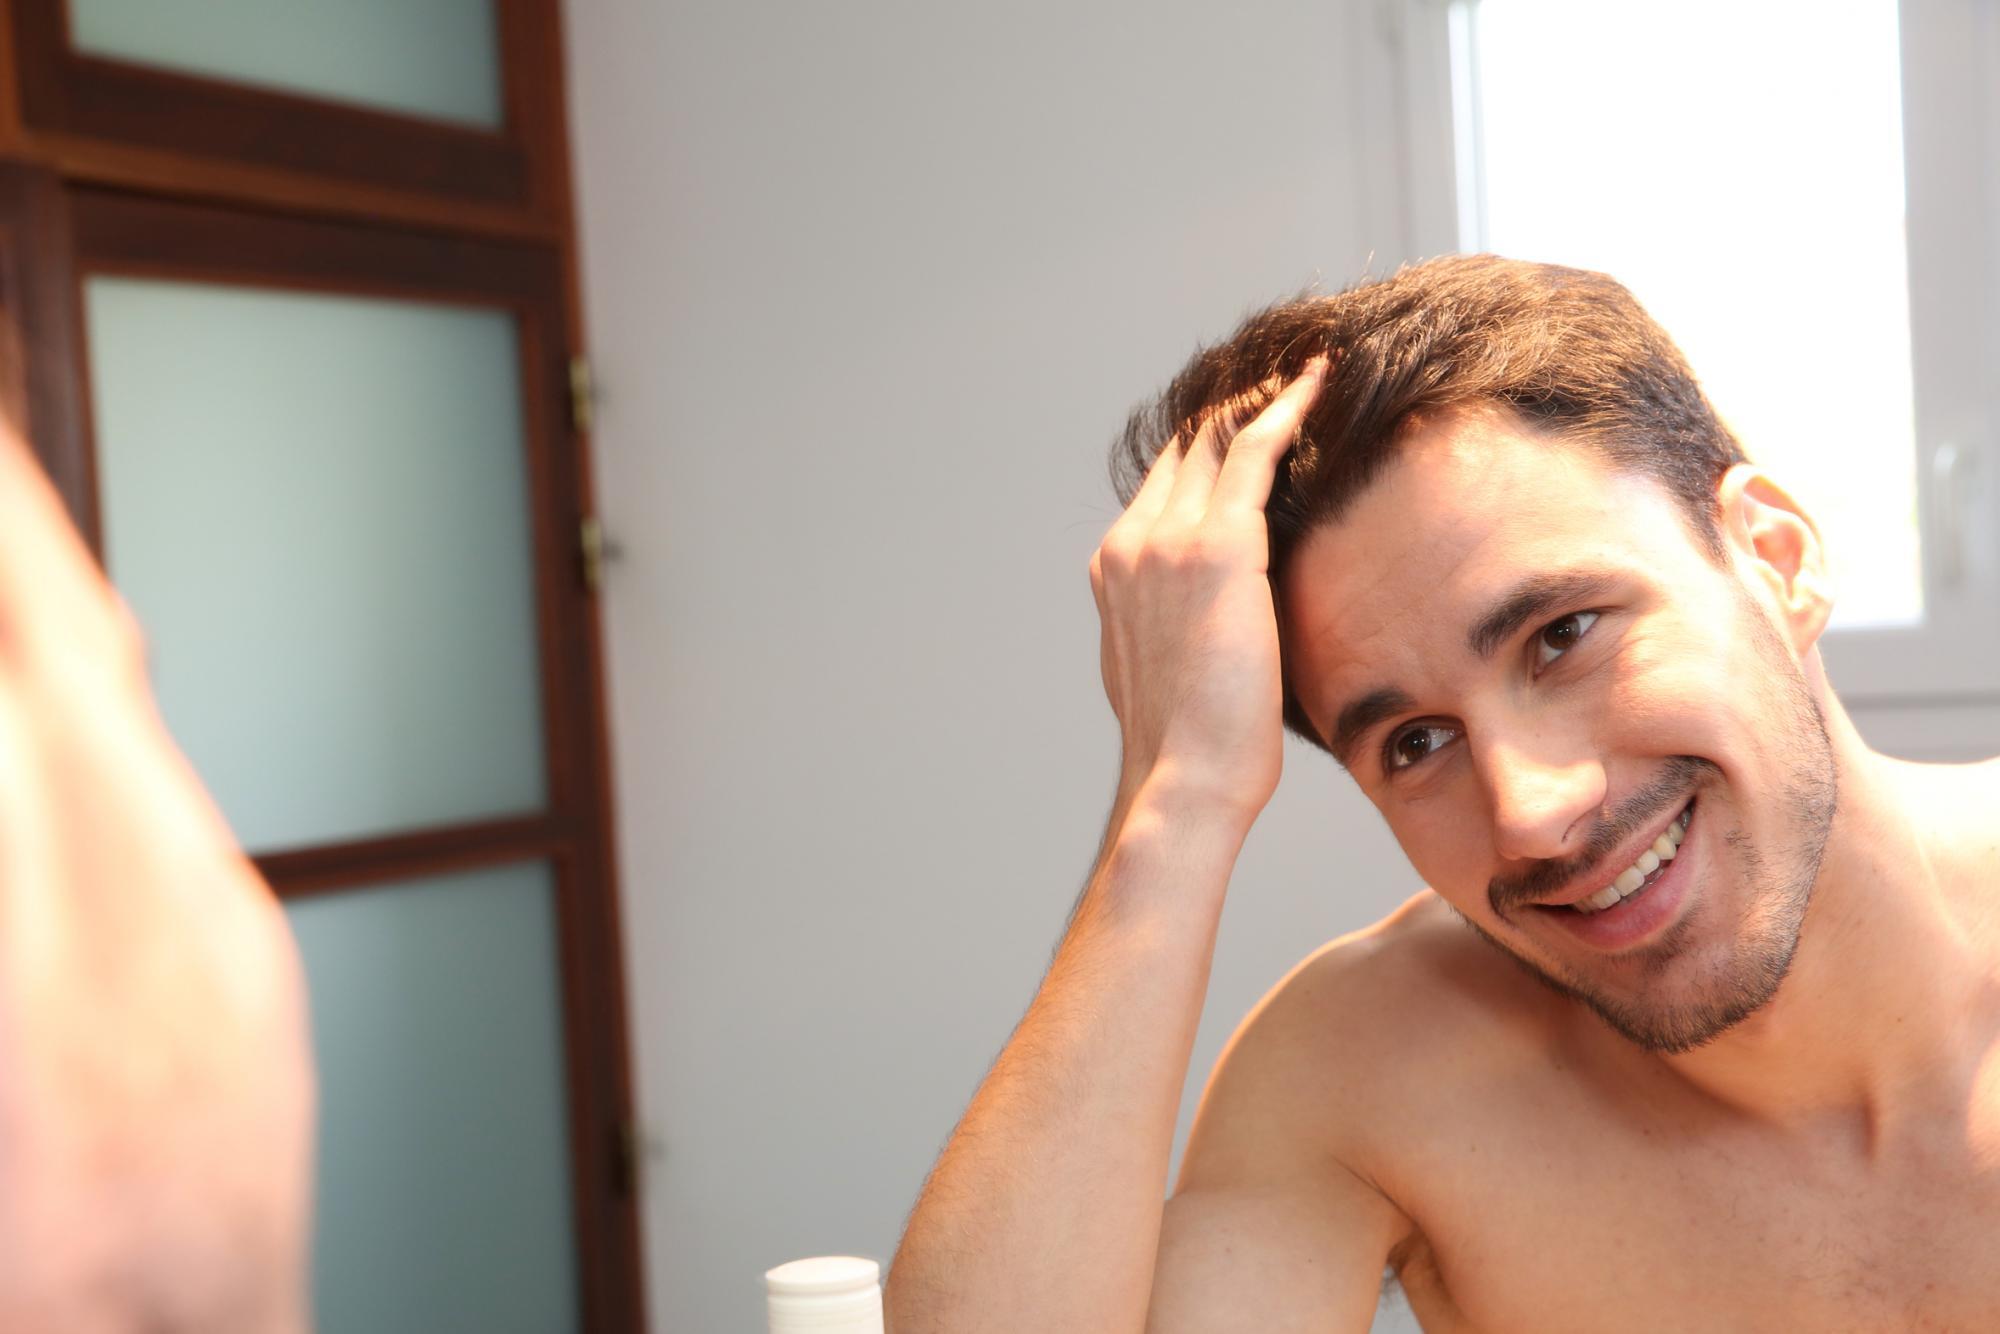 imagesChute-de-cheveux-homme-2.jpg